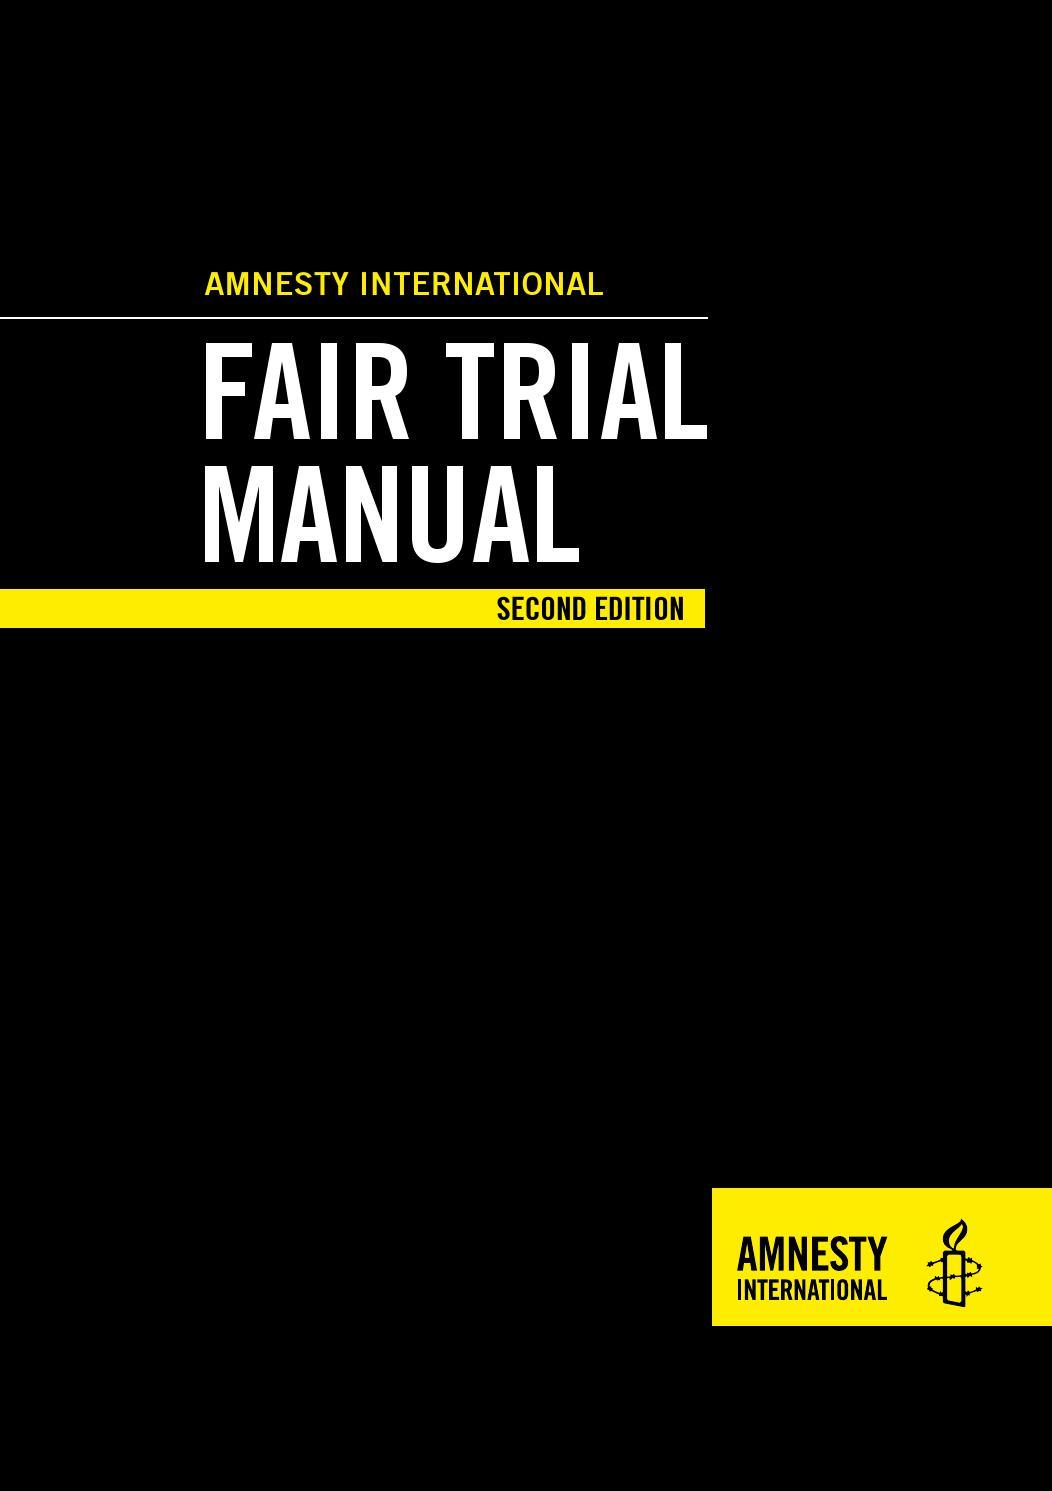 Amnesty International Fair Trial Manual - Second Edition by